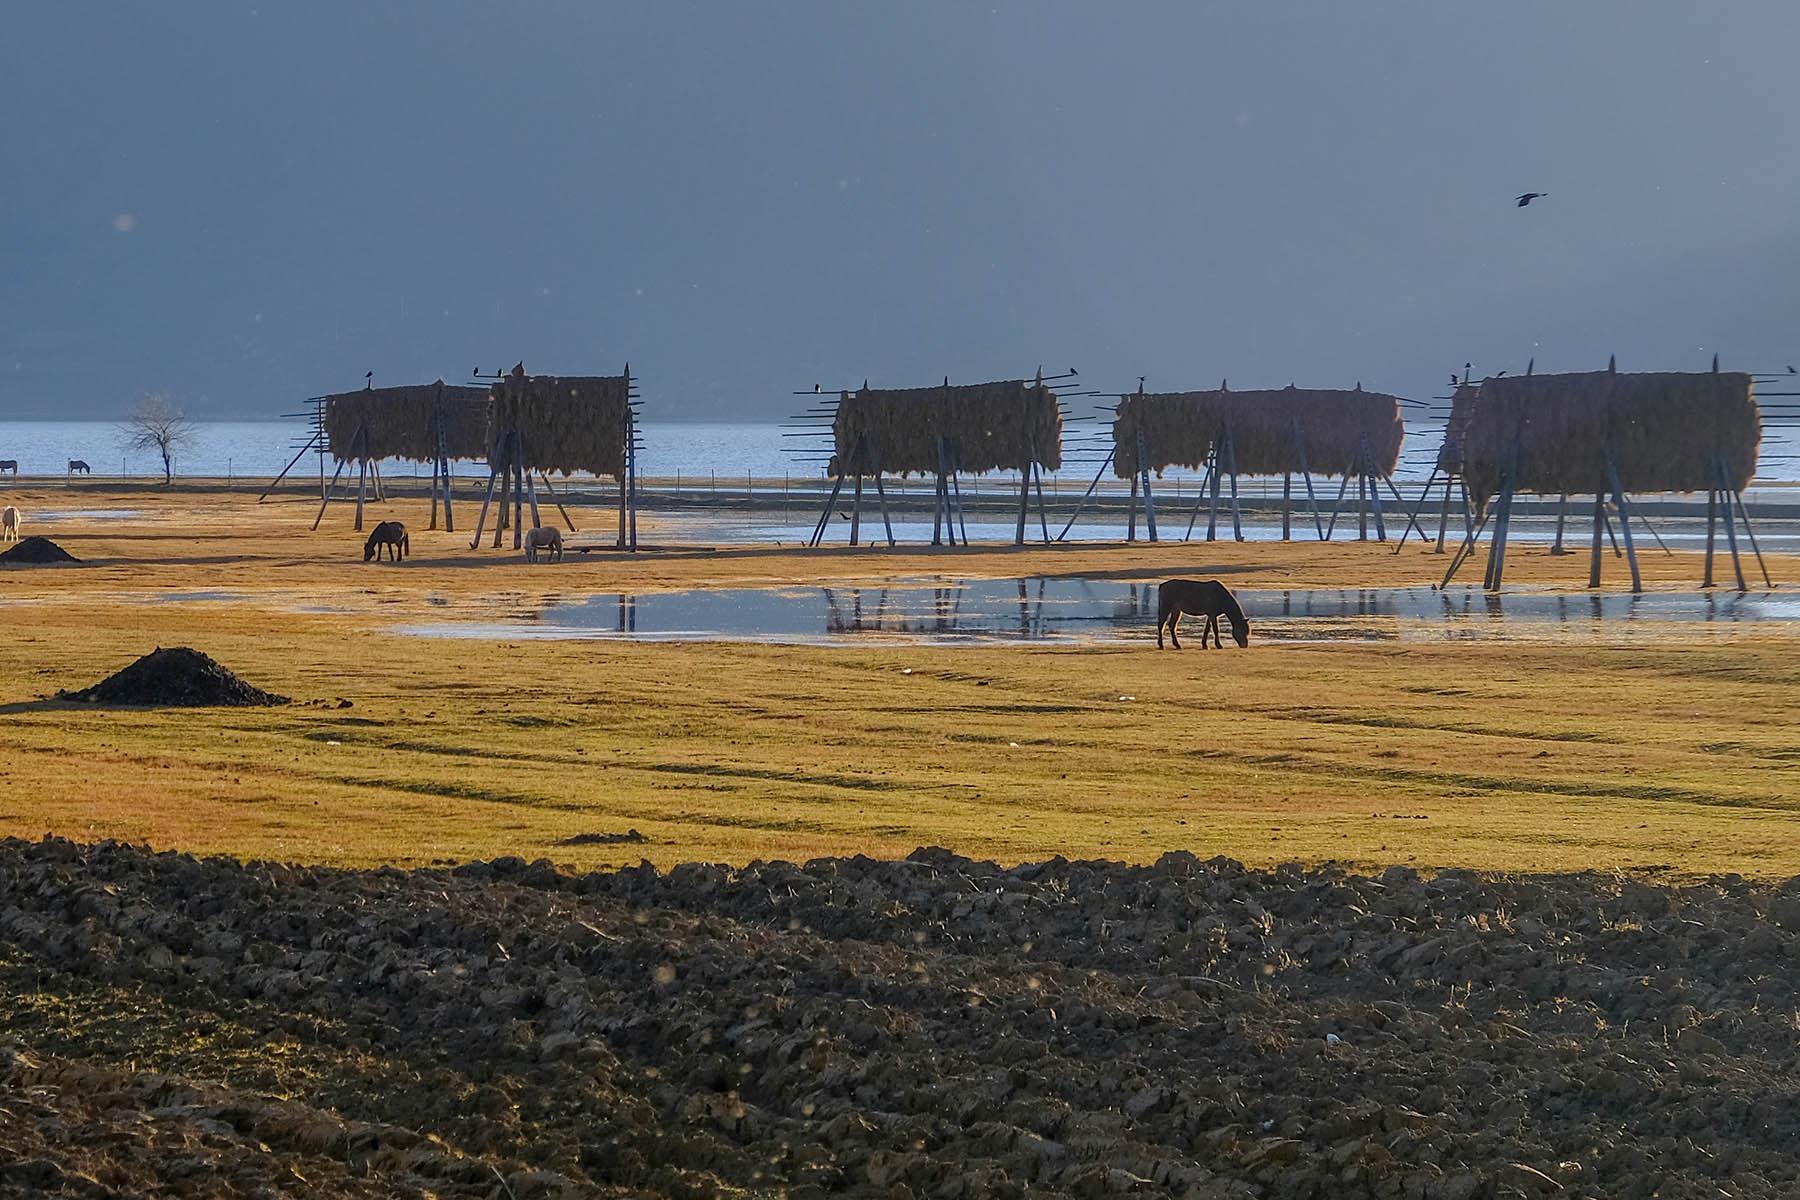 Blick auf den Napa See in Shangrila, Yunnan